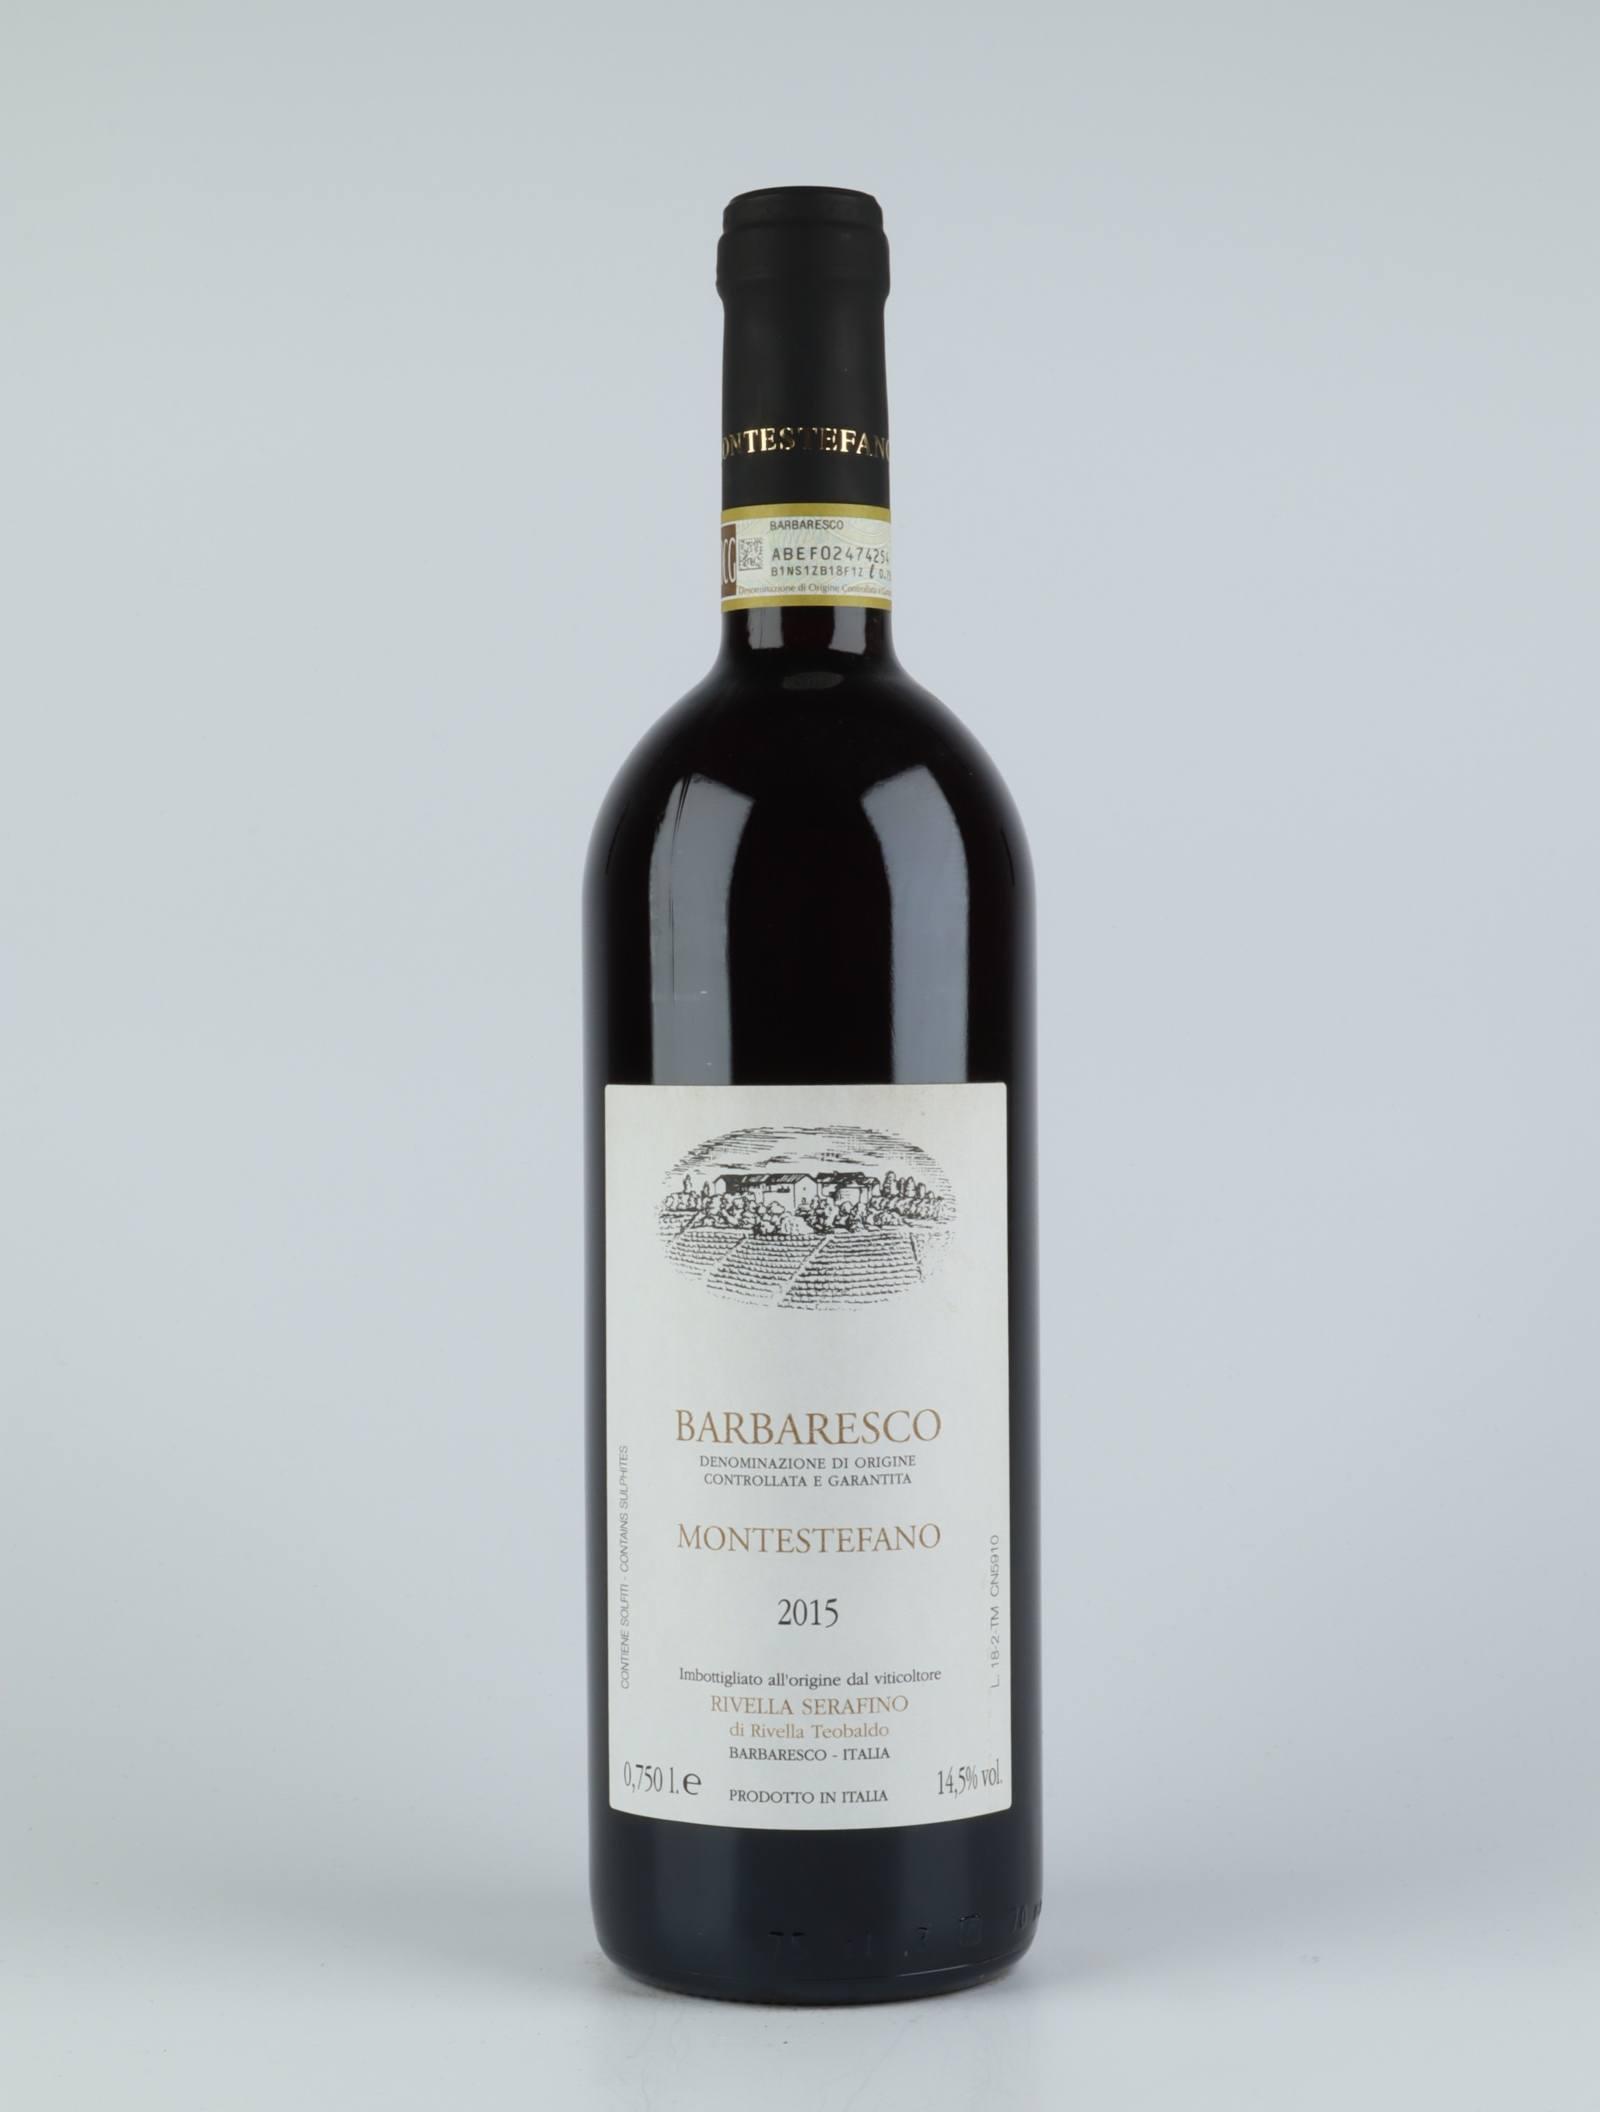 Barbaresco - Montestefano